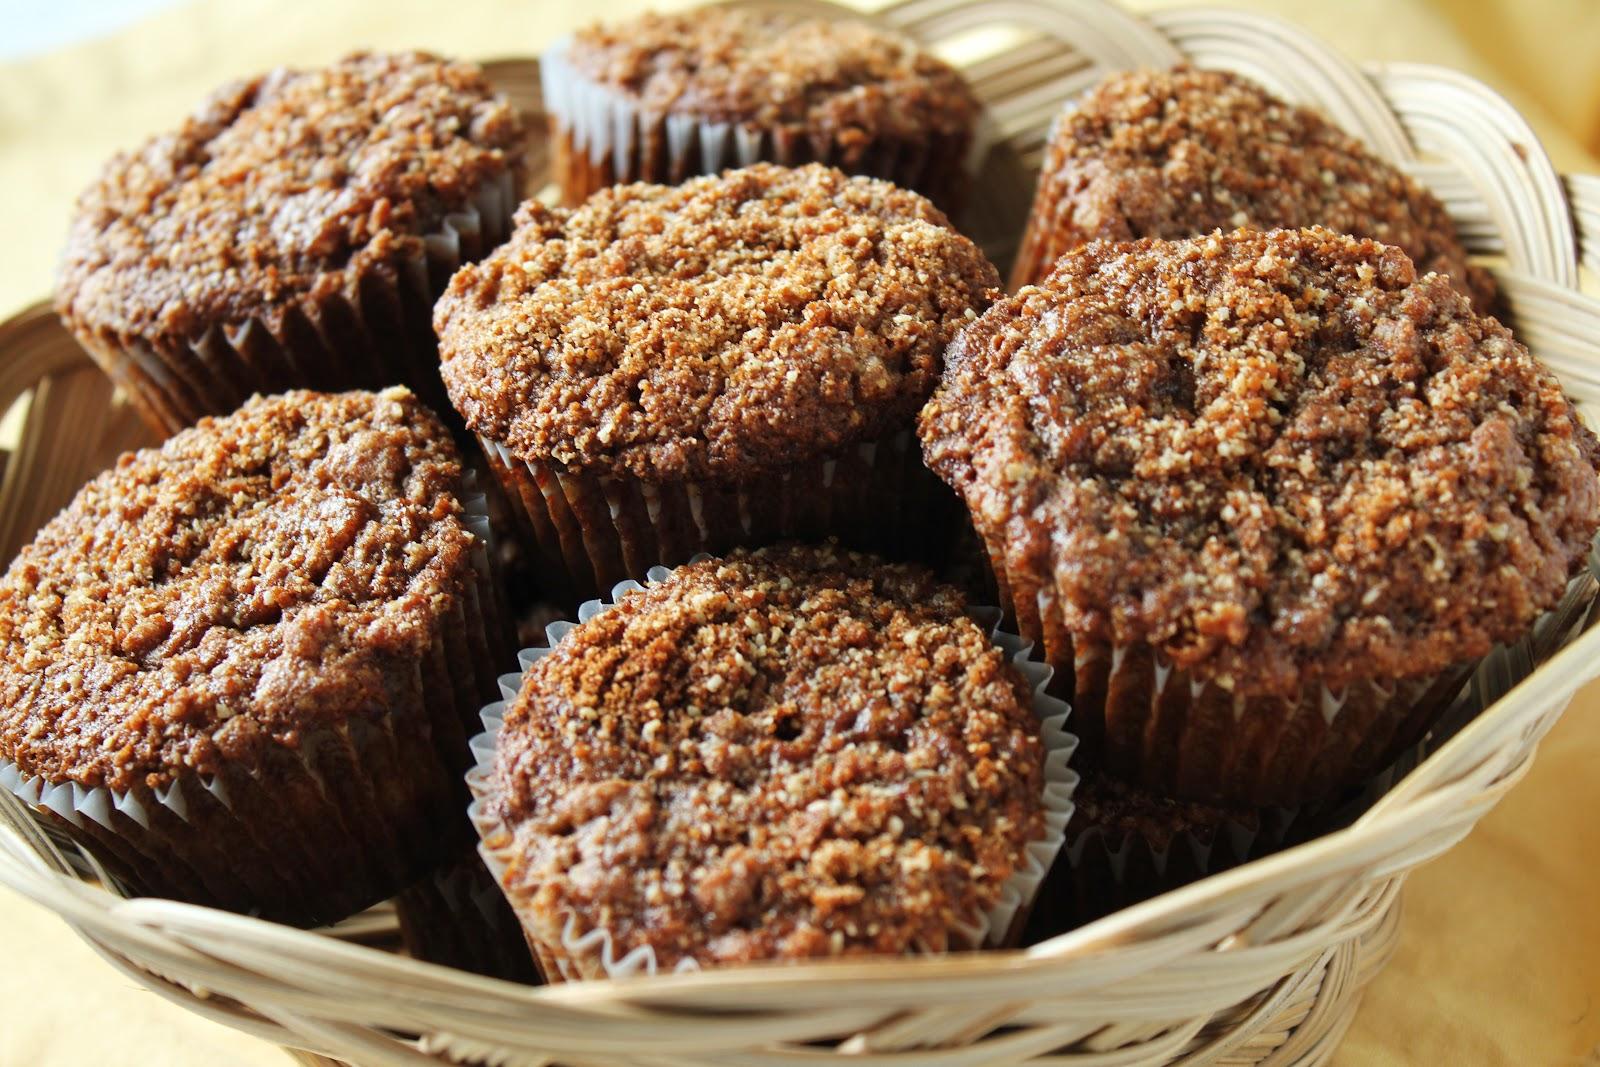 ... banana crumb muffins banana crumb muffins banana crumb muffins